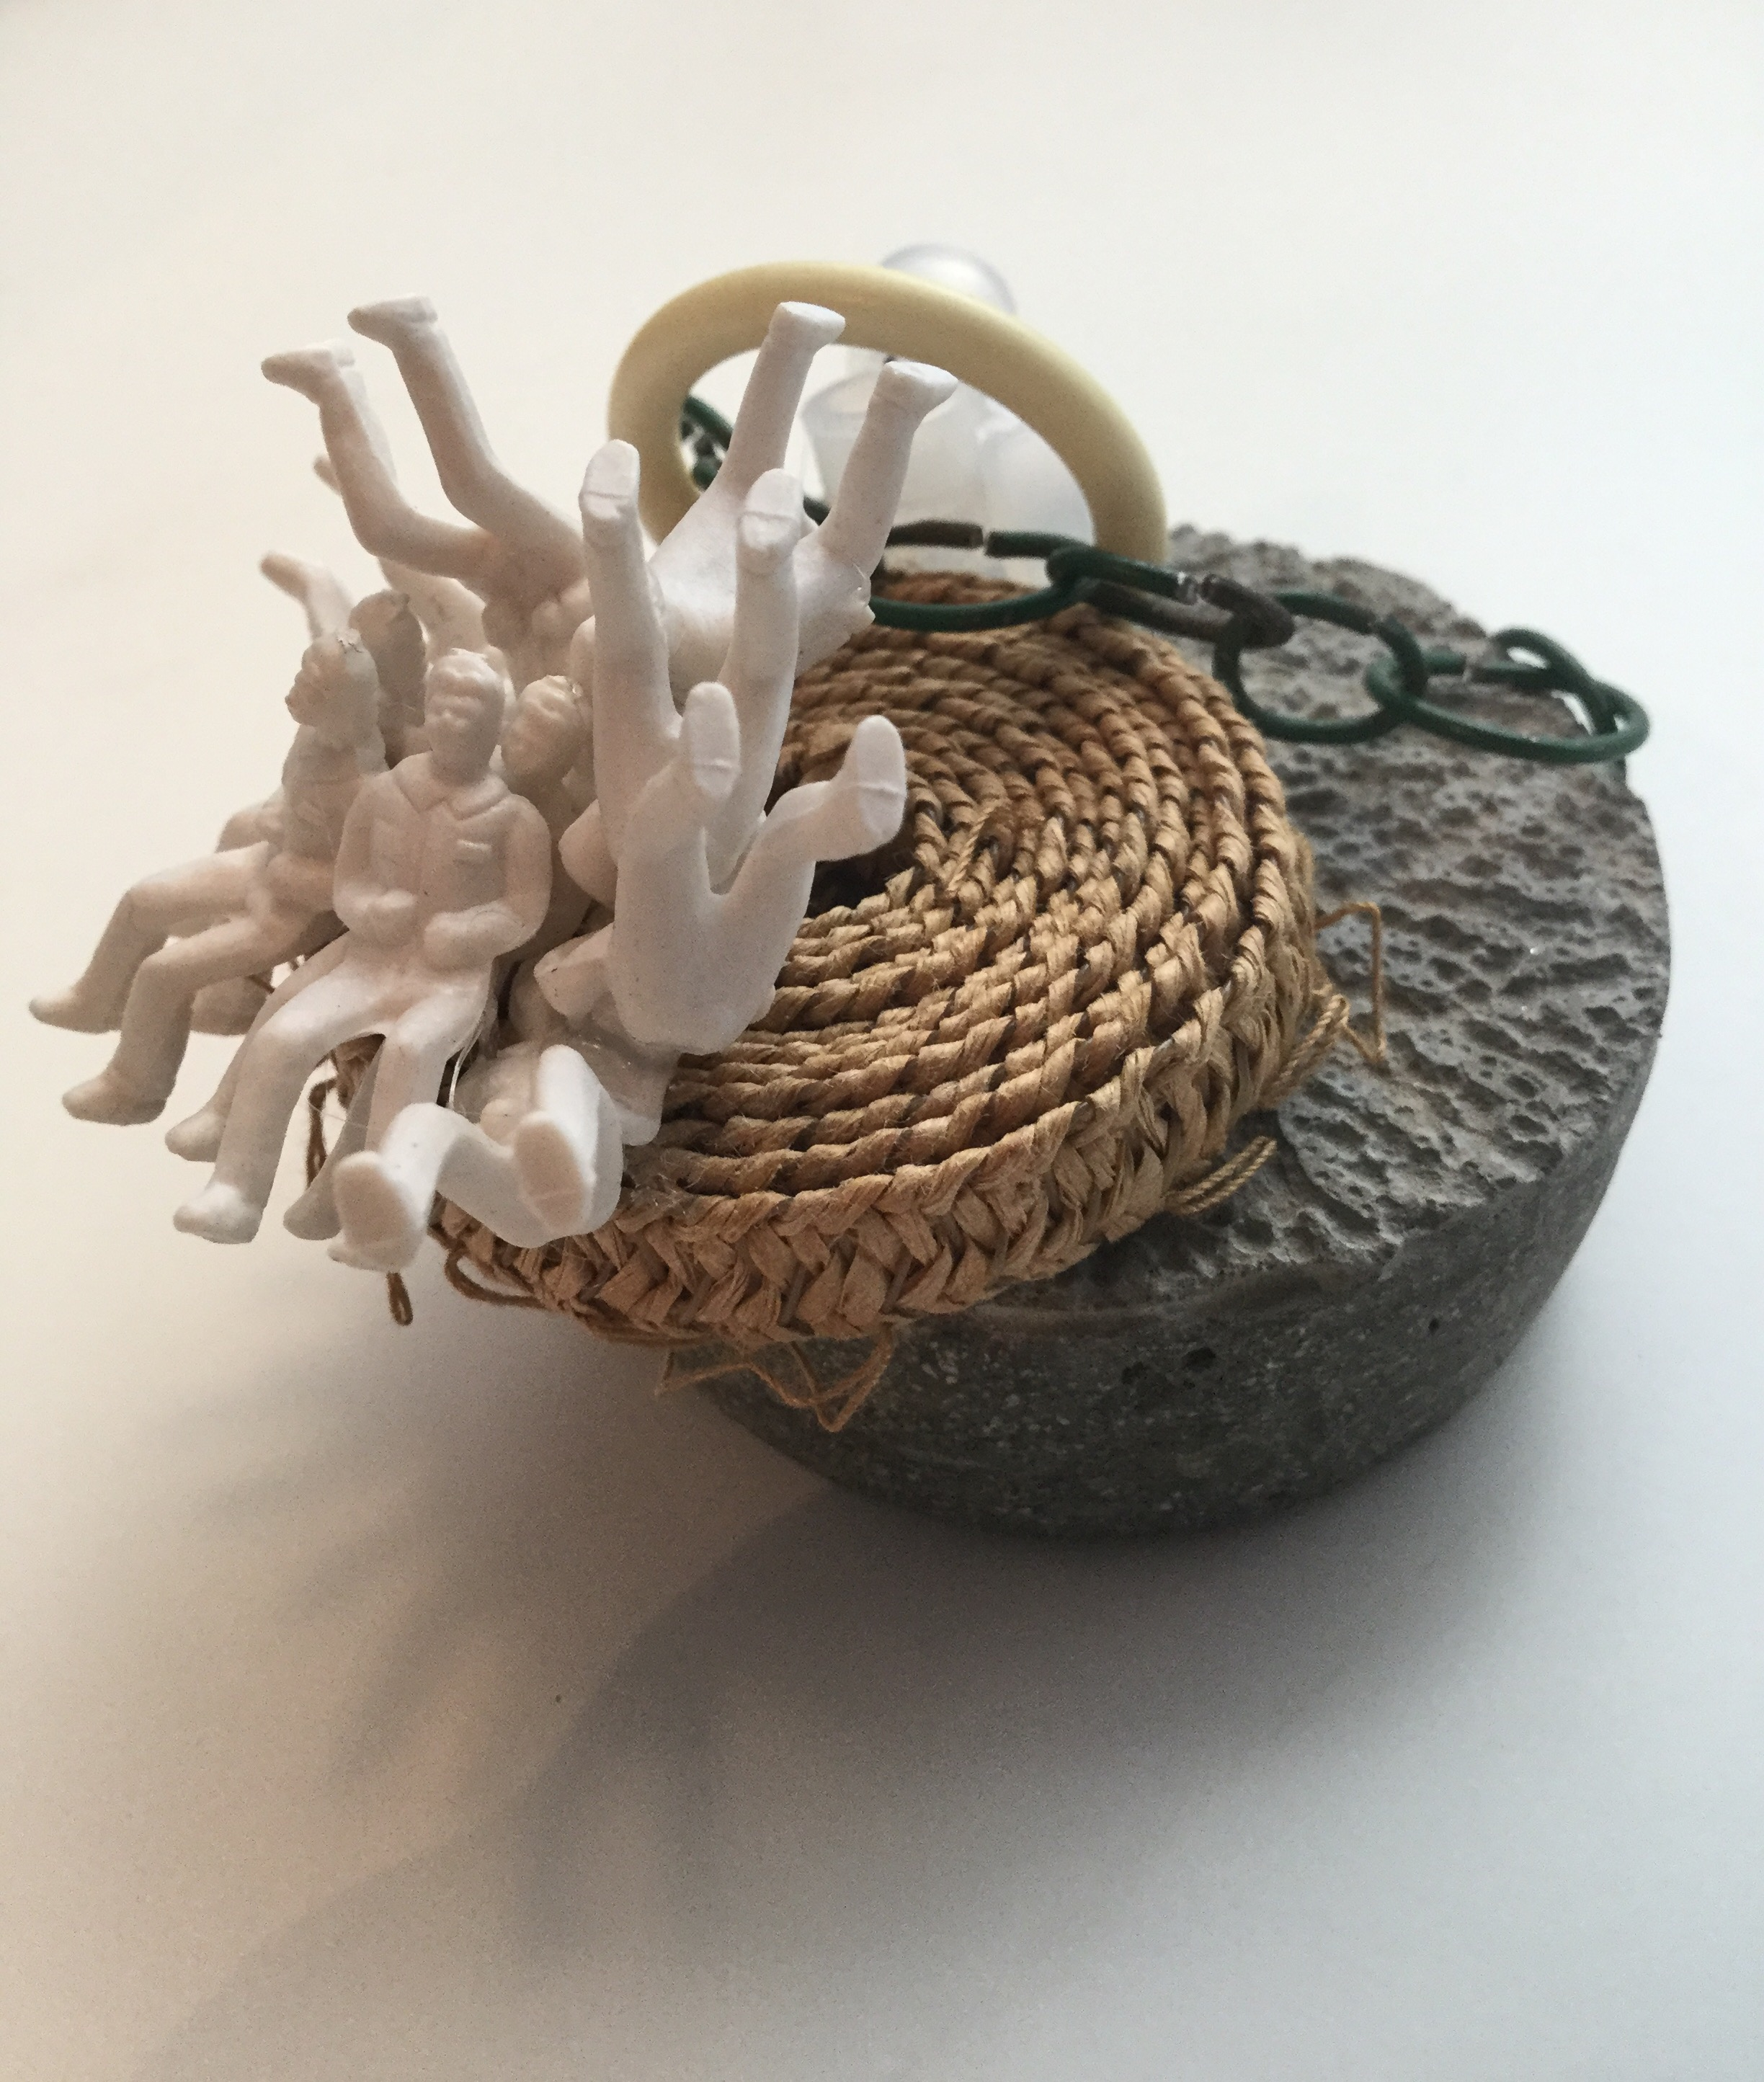 Anthropcene Madrepora Coral